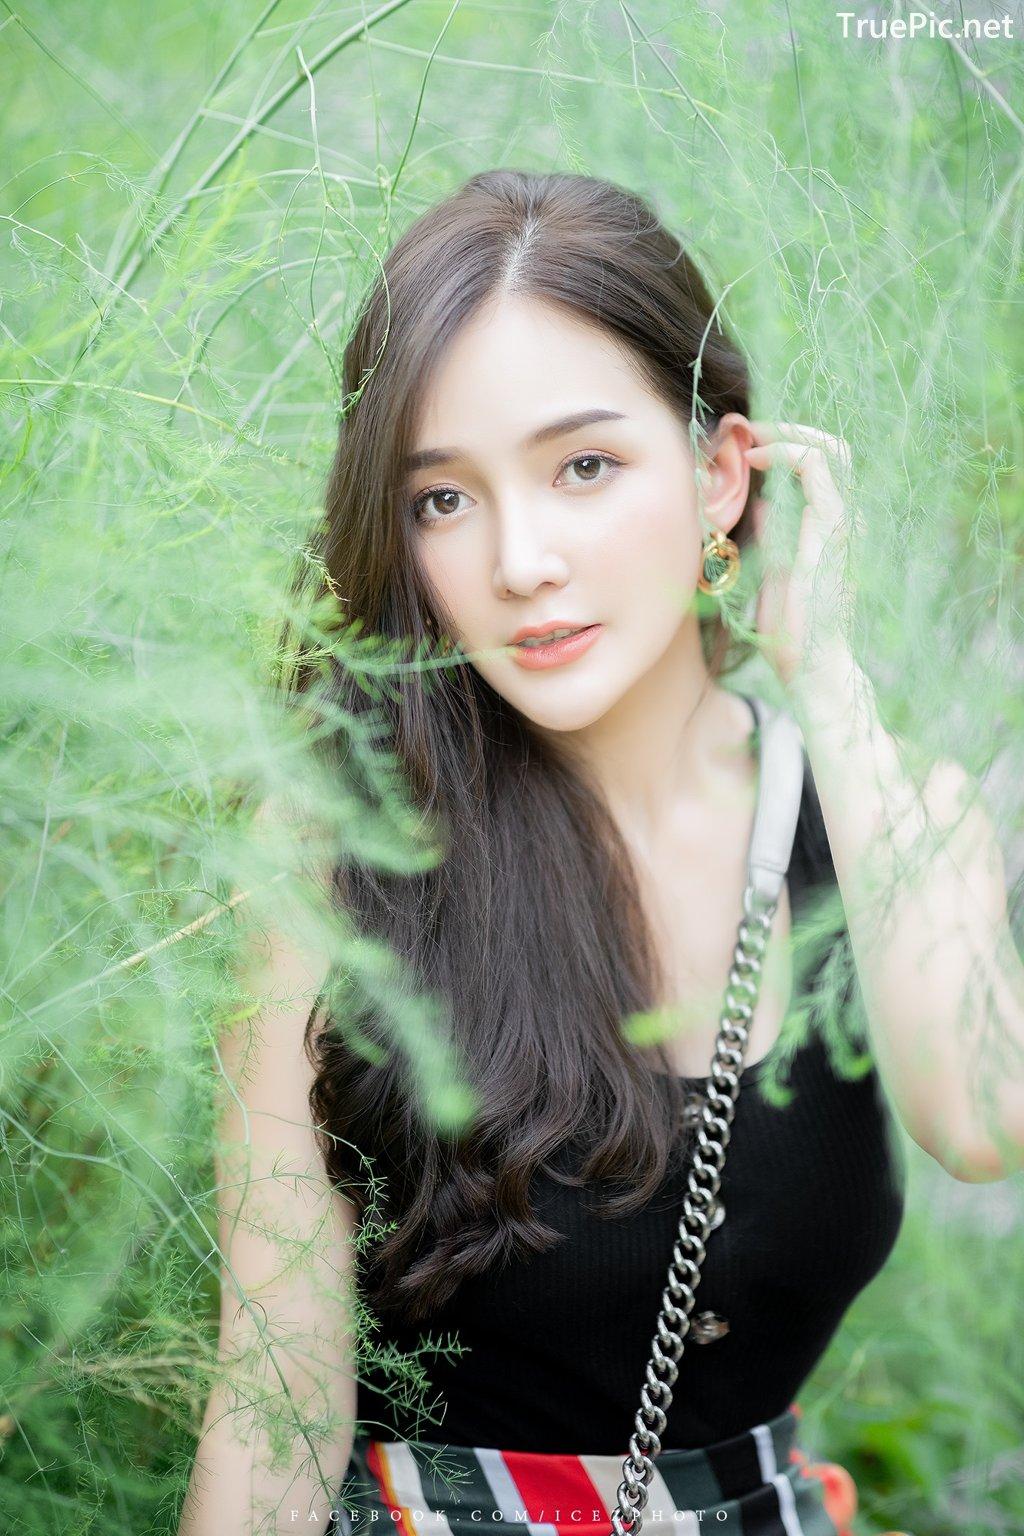 Image-Thailand-Model-Rossarin-Klinhom-Beautiful-Girl-Lost-In-The-Flower-Garden-TruePic.net- Picture-6